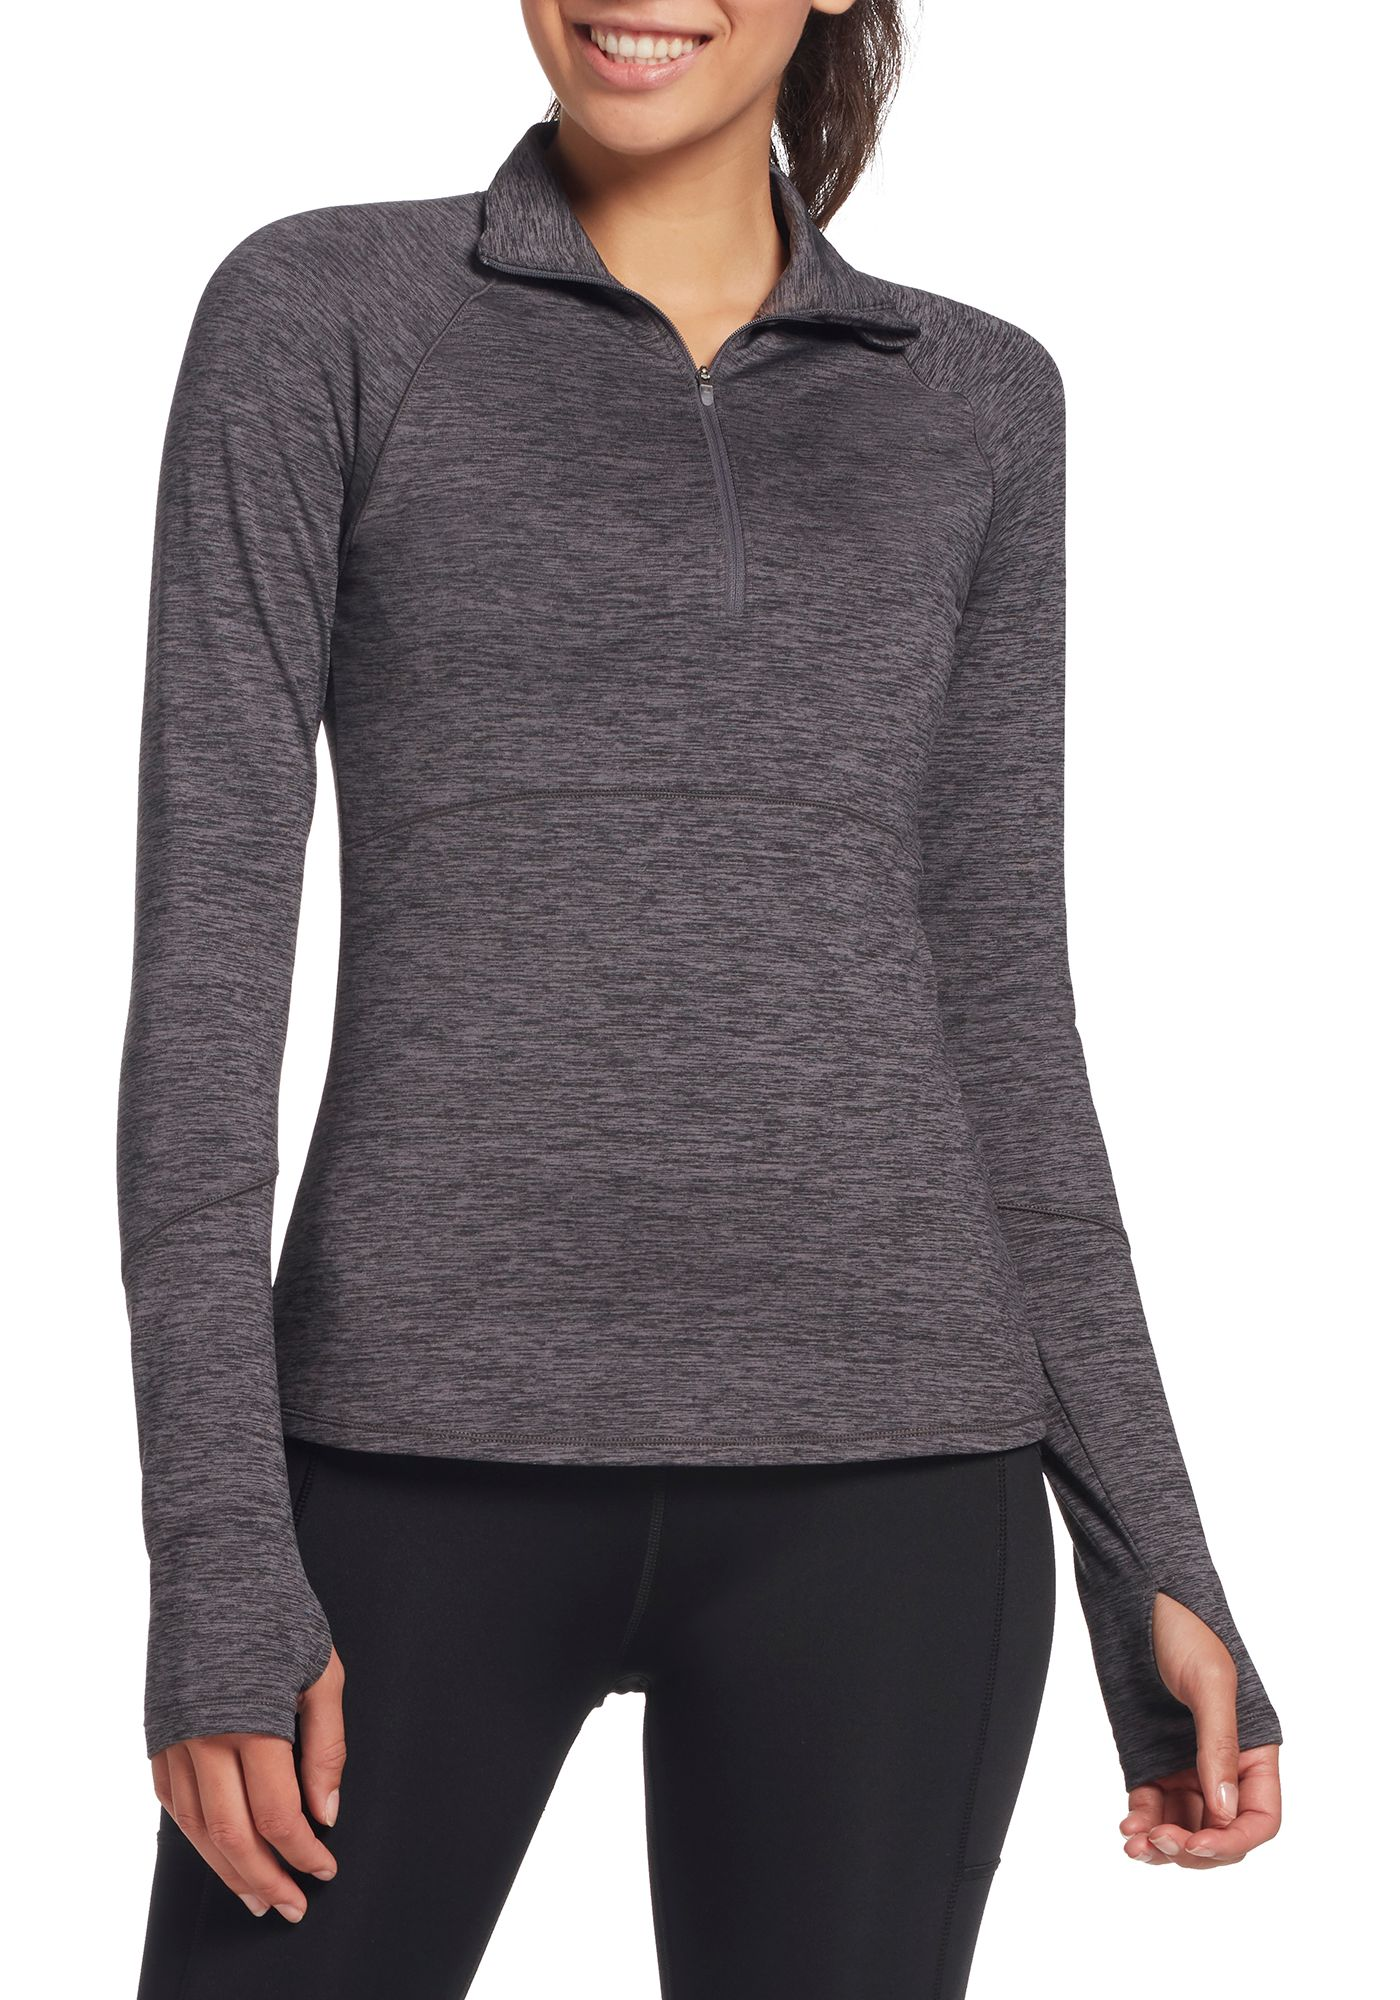 DSG Women's Cold Weather 1/2 Zip Long Sleeve Shirt